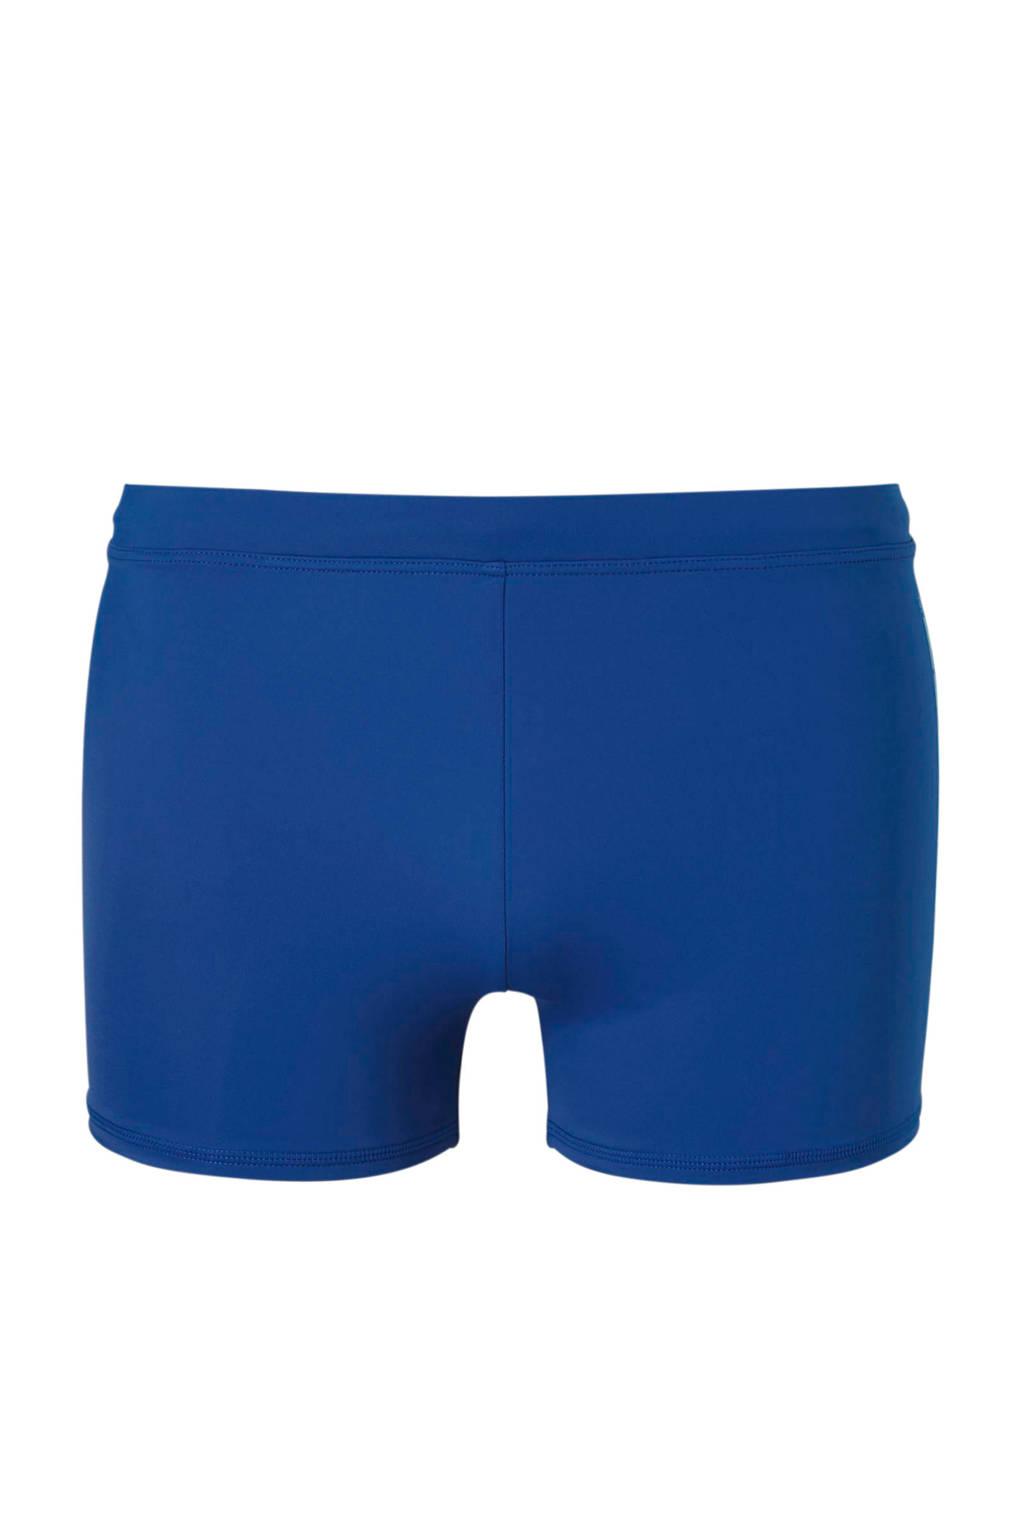 Protest zwemboxer blauw, Blauw